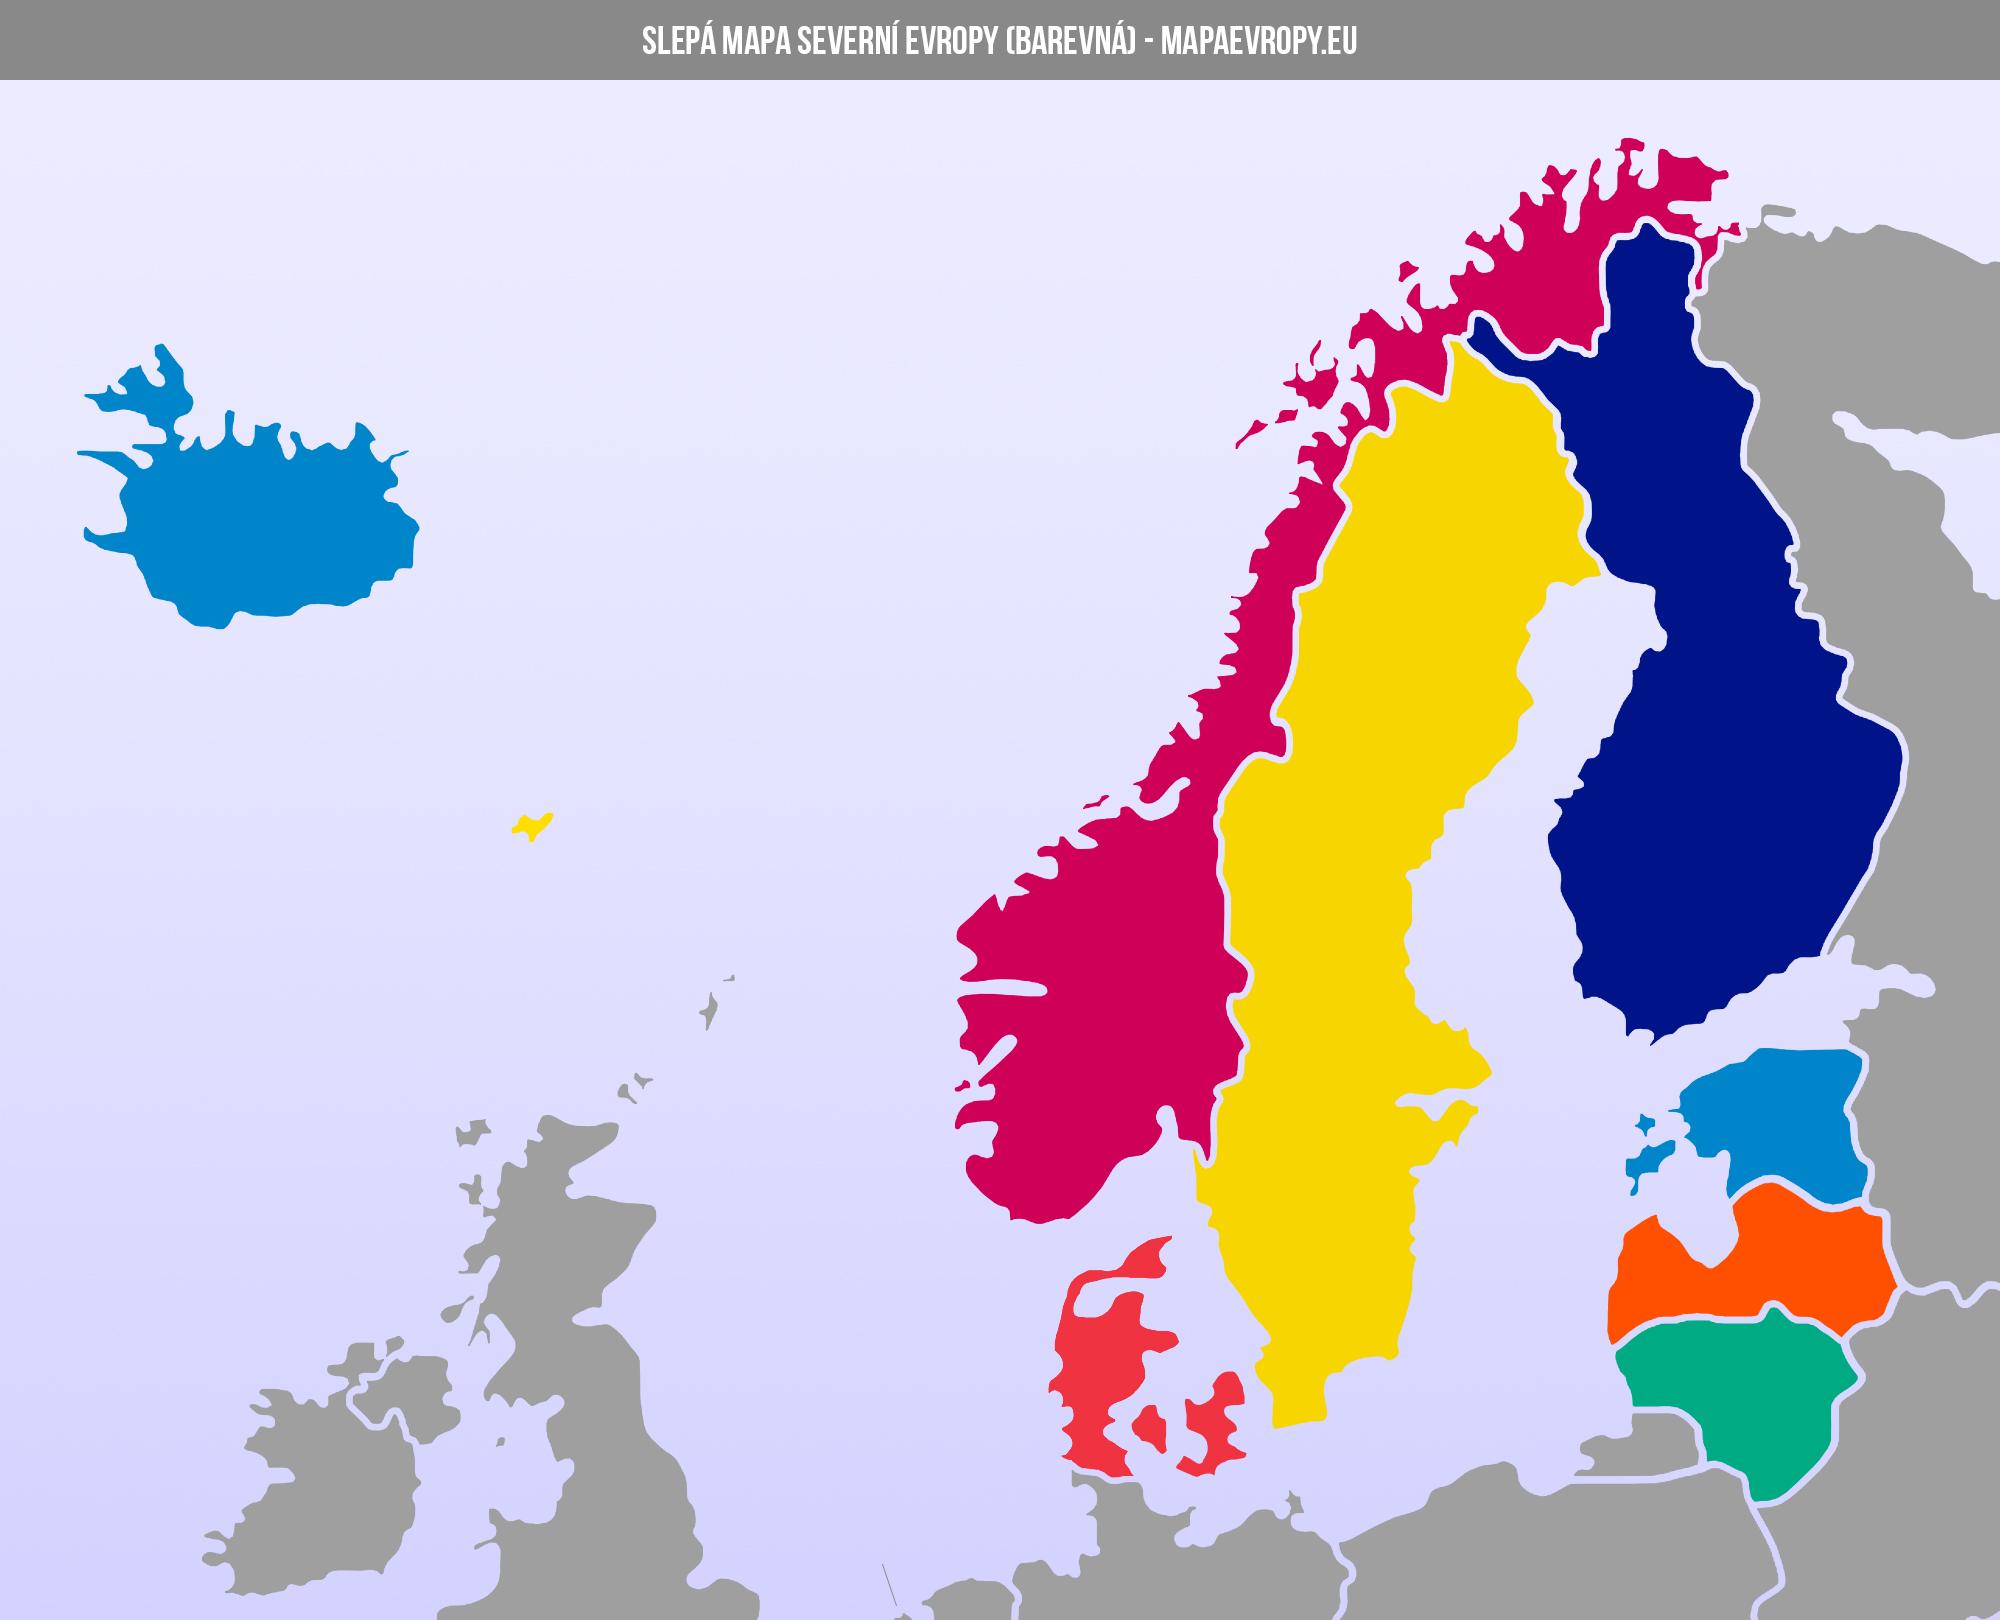 Mapa Severni Evropy Politicka A Slepa Mapaevropy Eu